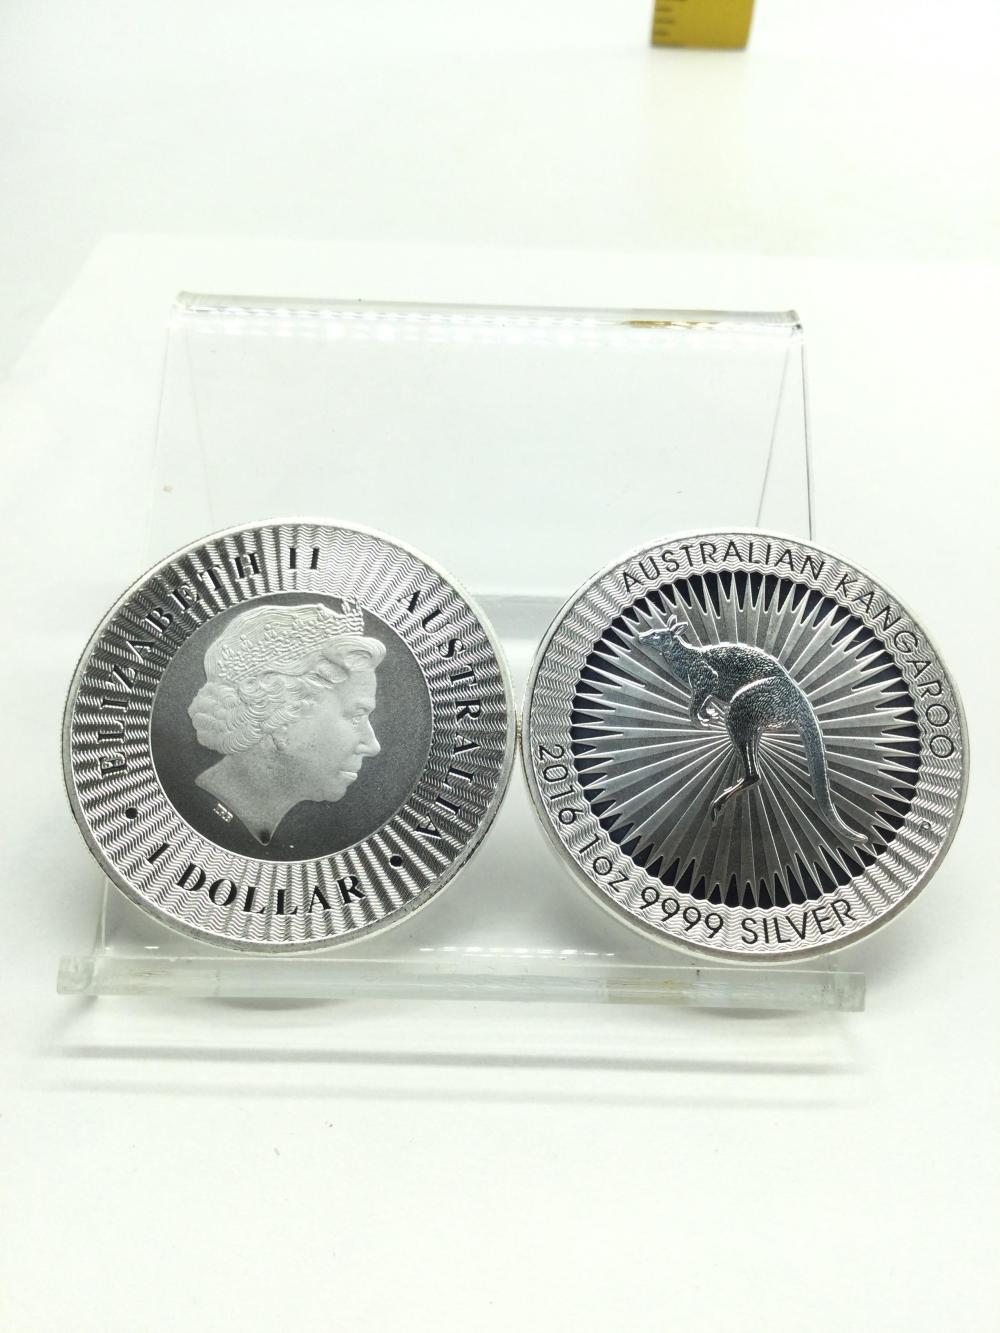 2 Australian 1 Argent Ounce Fine Silver Rounds